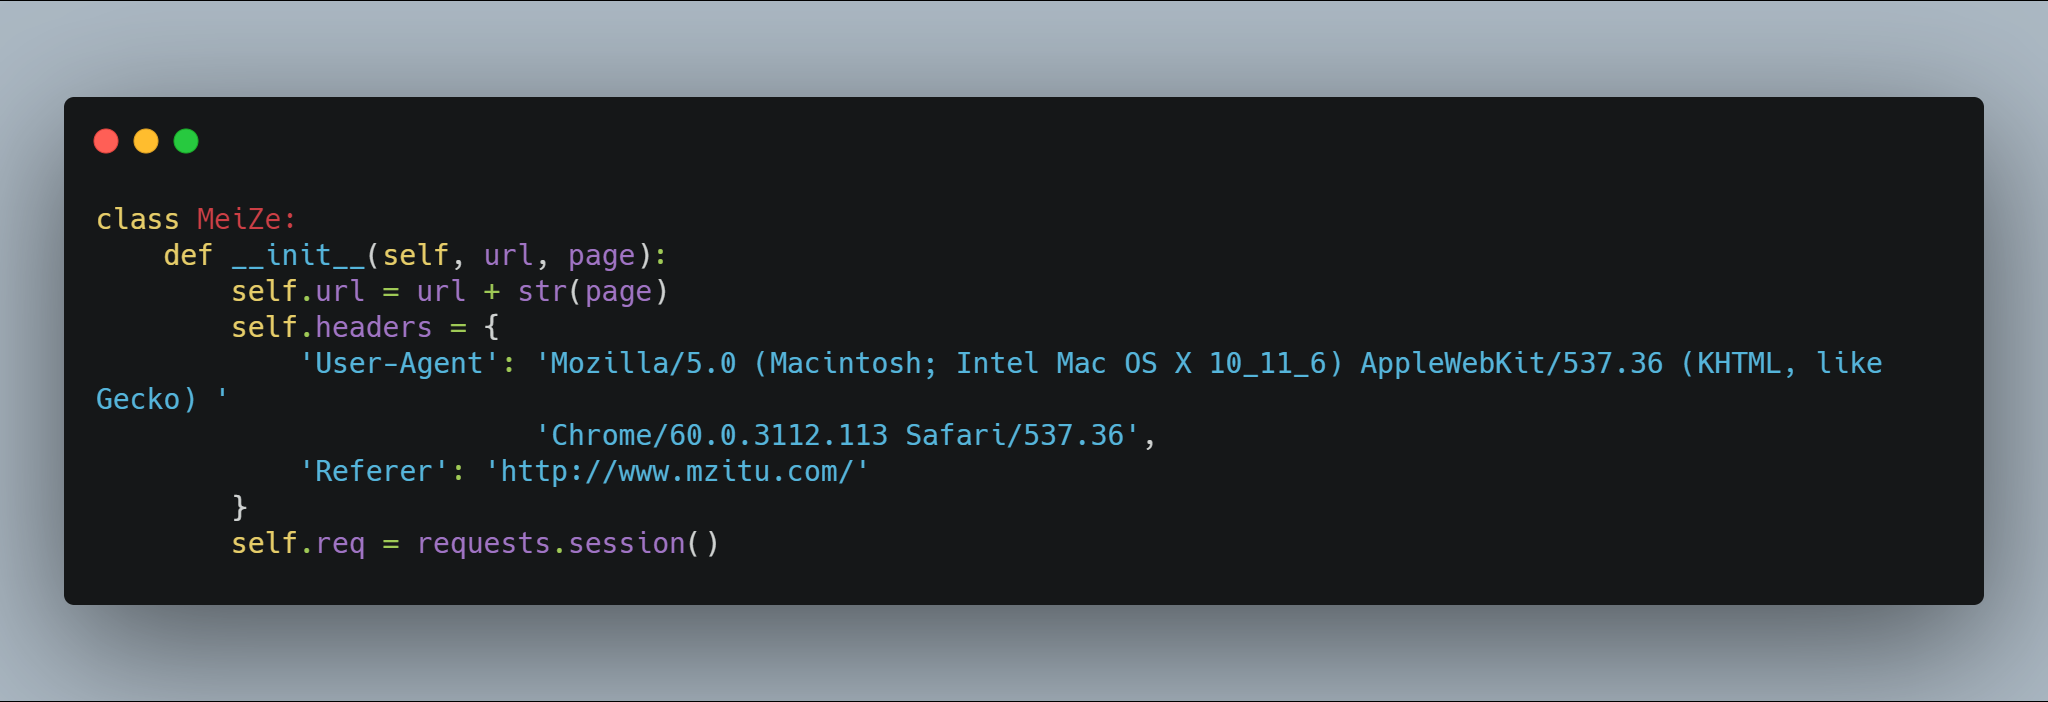 nginx之proxy_pass代理后端https请求完全拆解